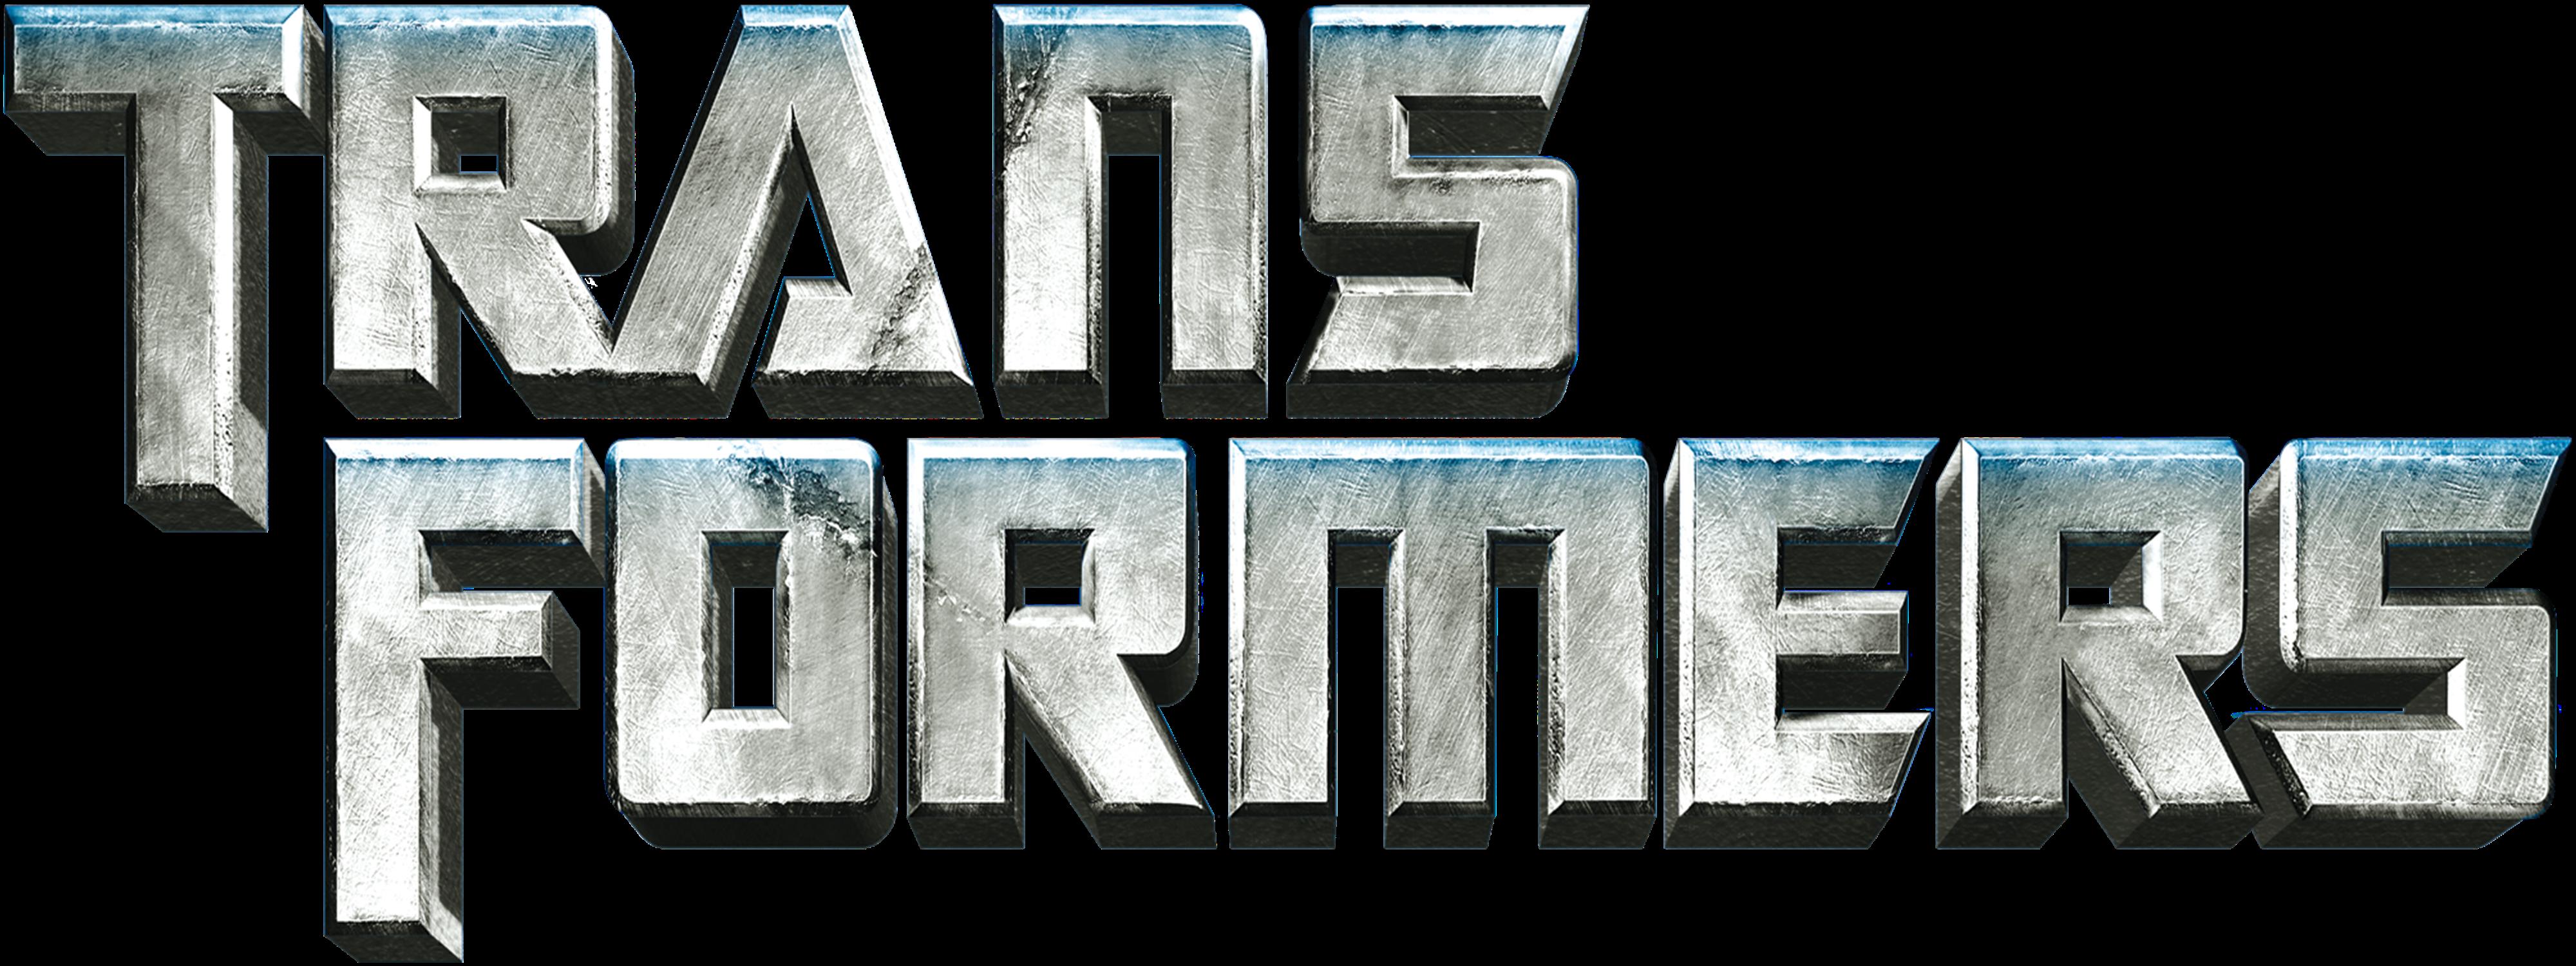 Transformers logo (2) by sonamyfan03 - 7186.5KB